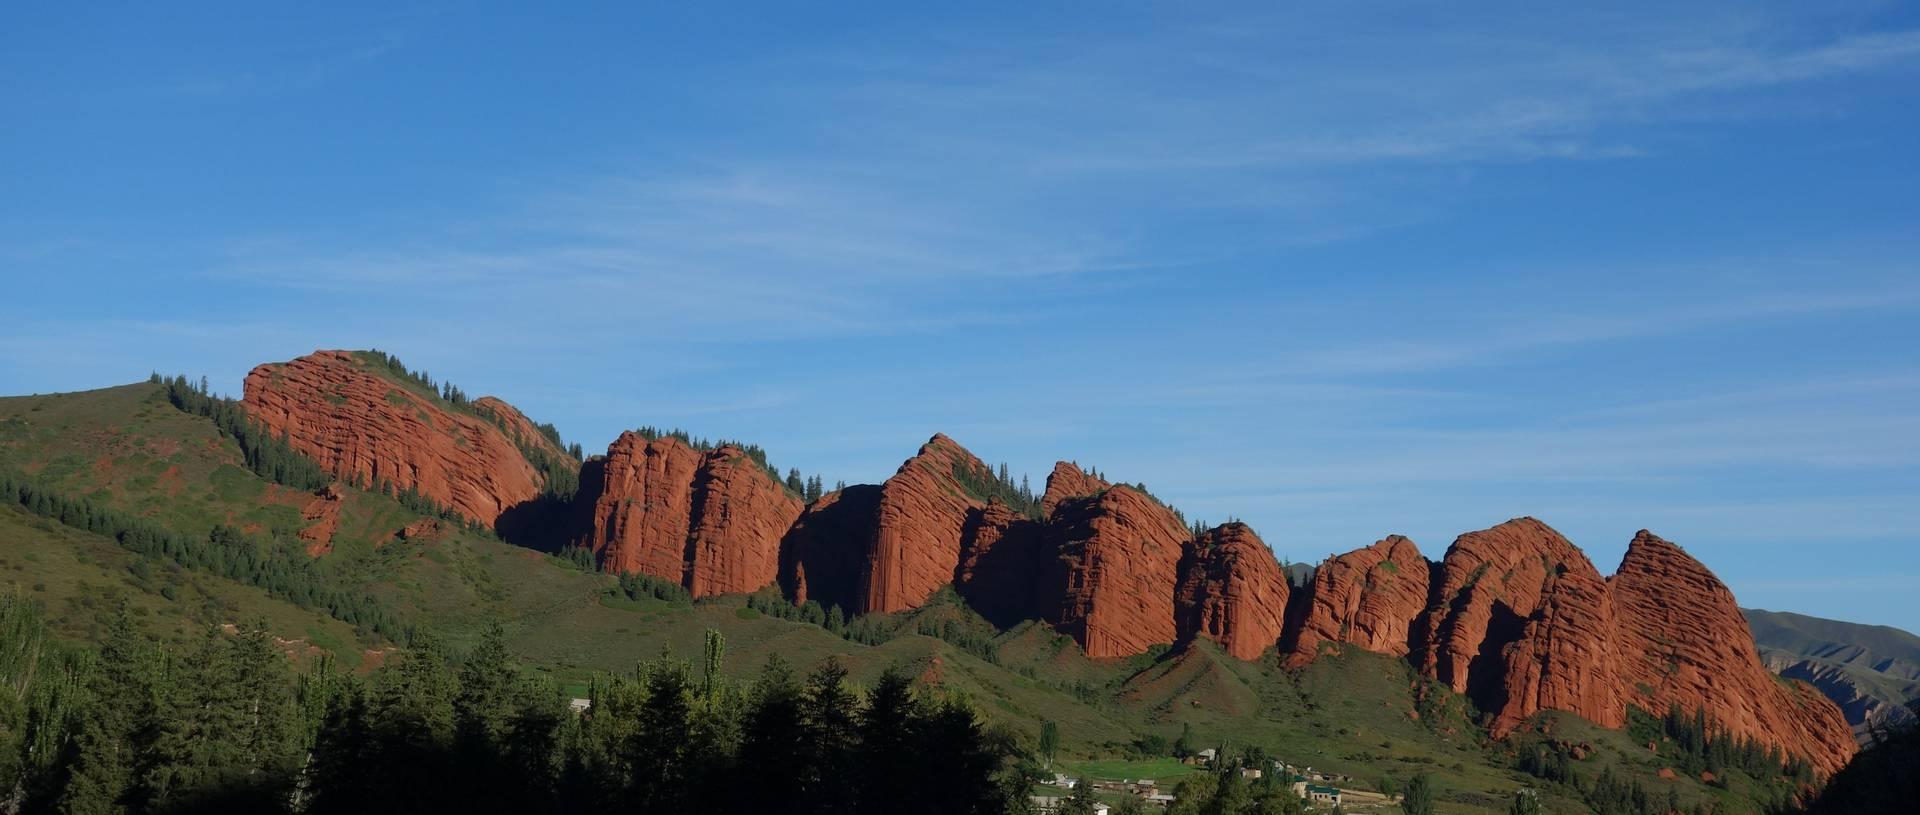 Jeti Orguz And The 7 Bull Rocks